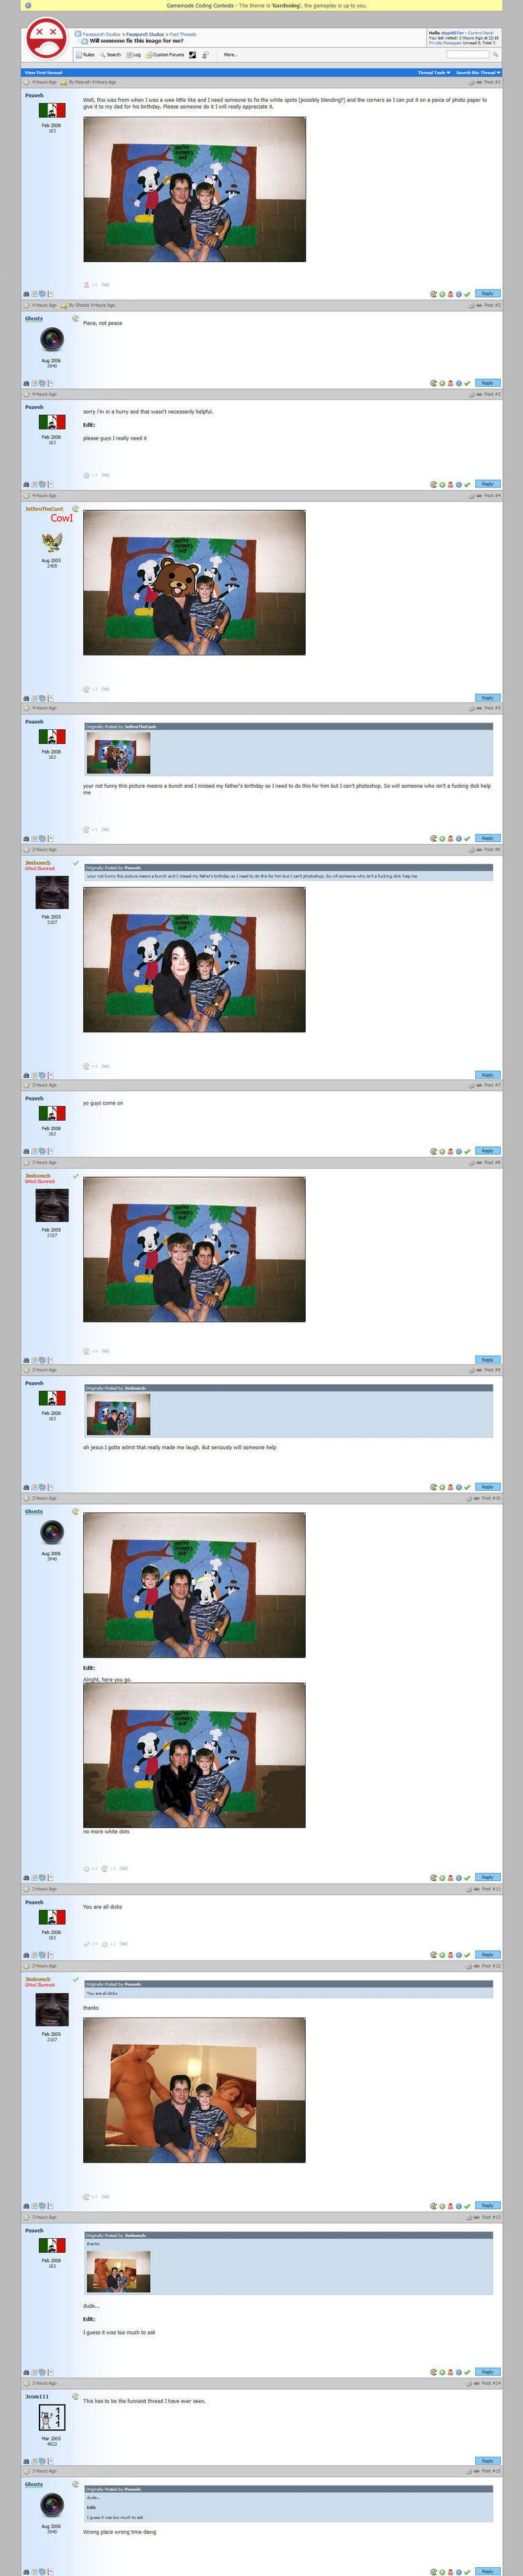 Trolling with Photoshop. off. Ronok - anino call' INF. onom/ 2 u an DEEP await emu 1 n muslums autumn 1 cam: Raina - call: 2 Solo»! 2 Photoshop troll trolling